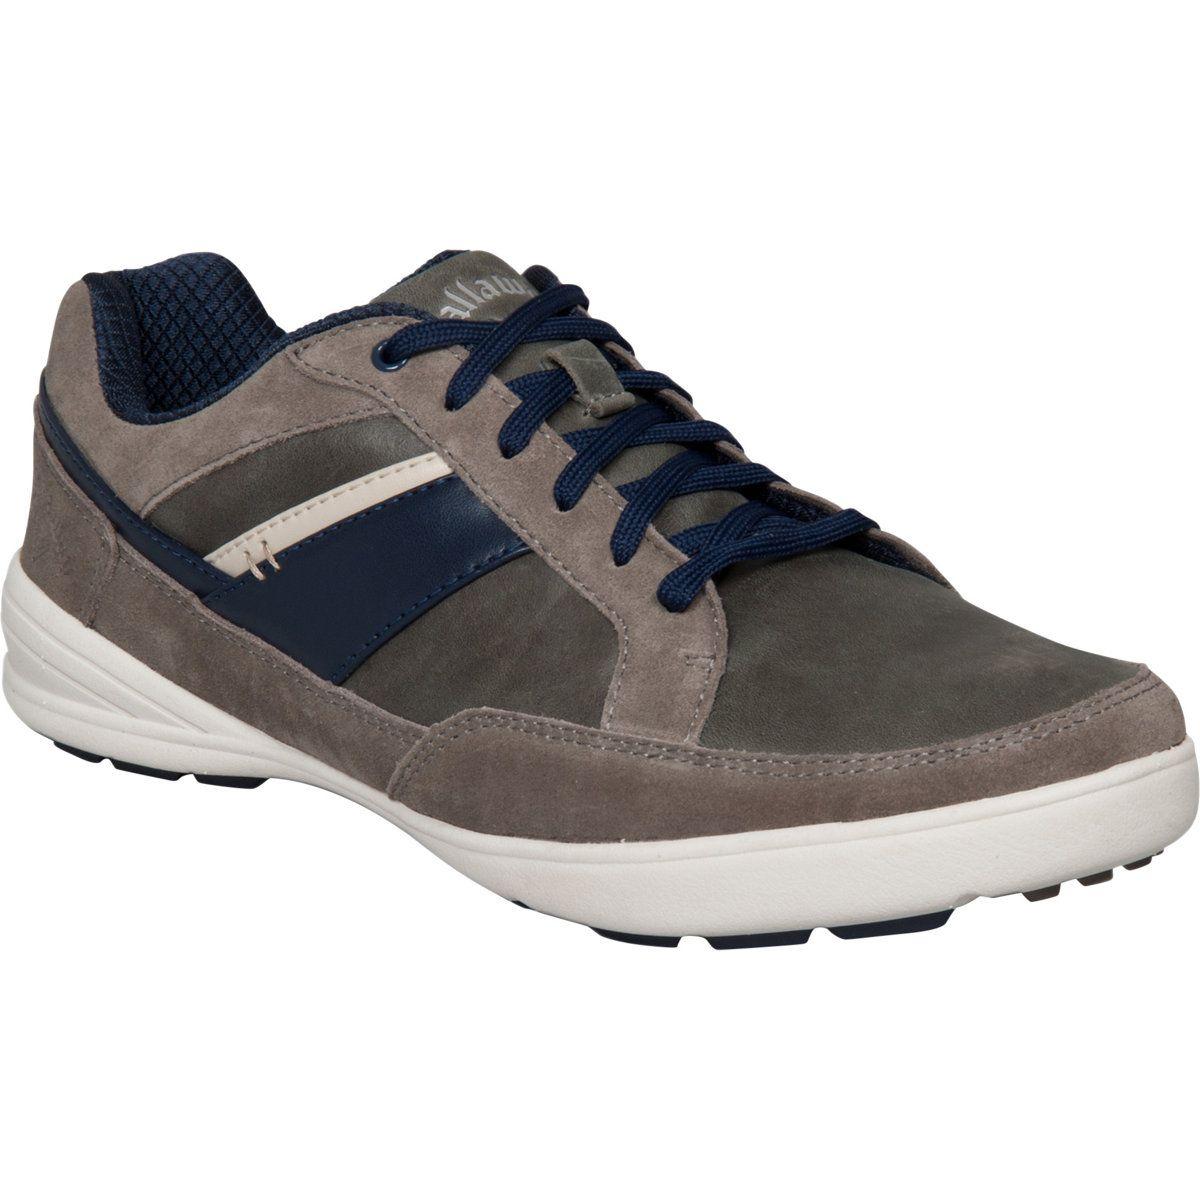 Callaway Men S Del Mar Zephyr Golf Shoe Grey Grey Navy